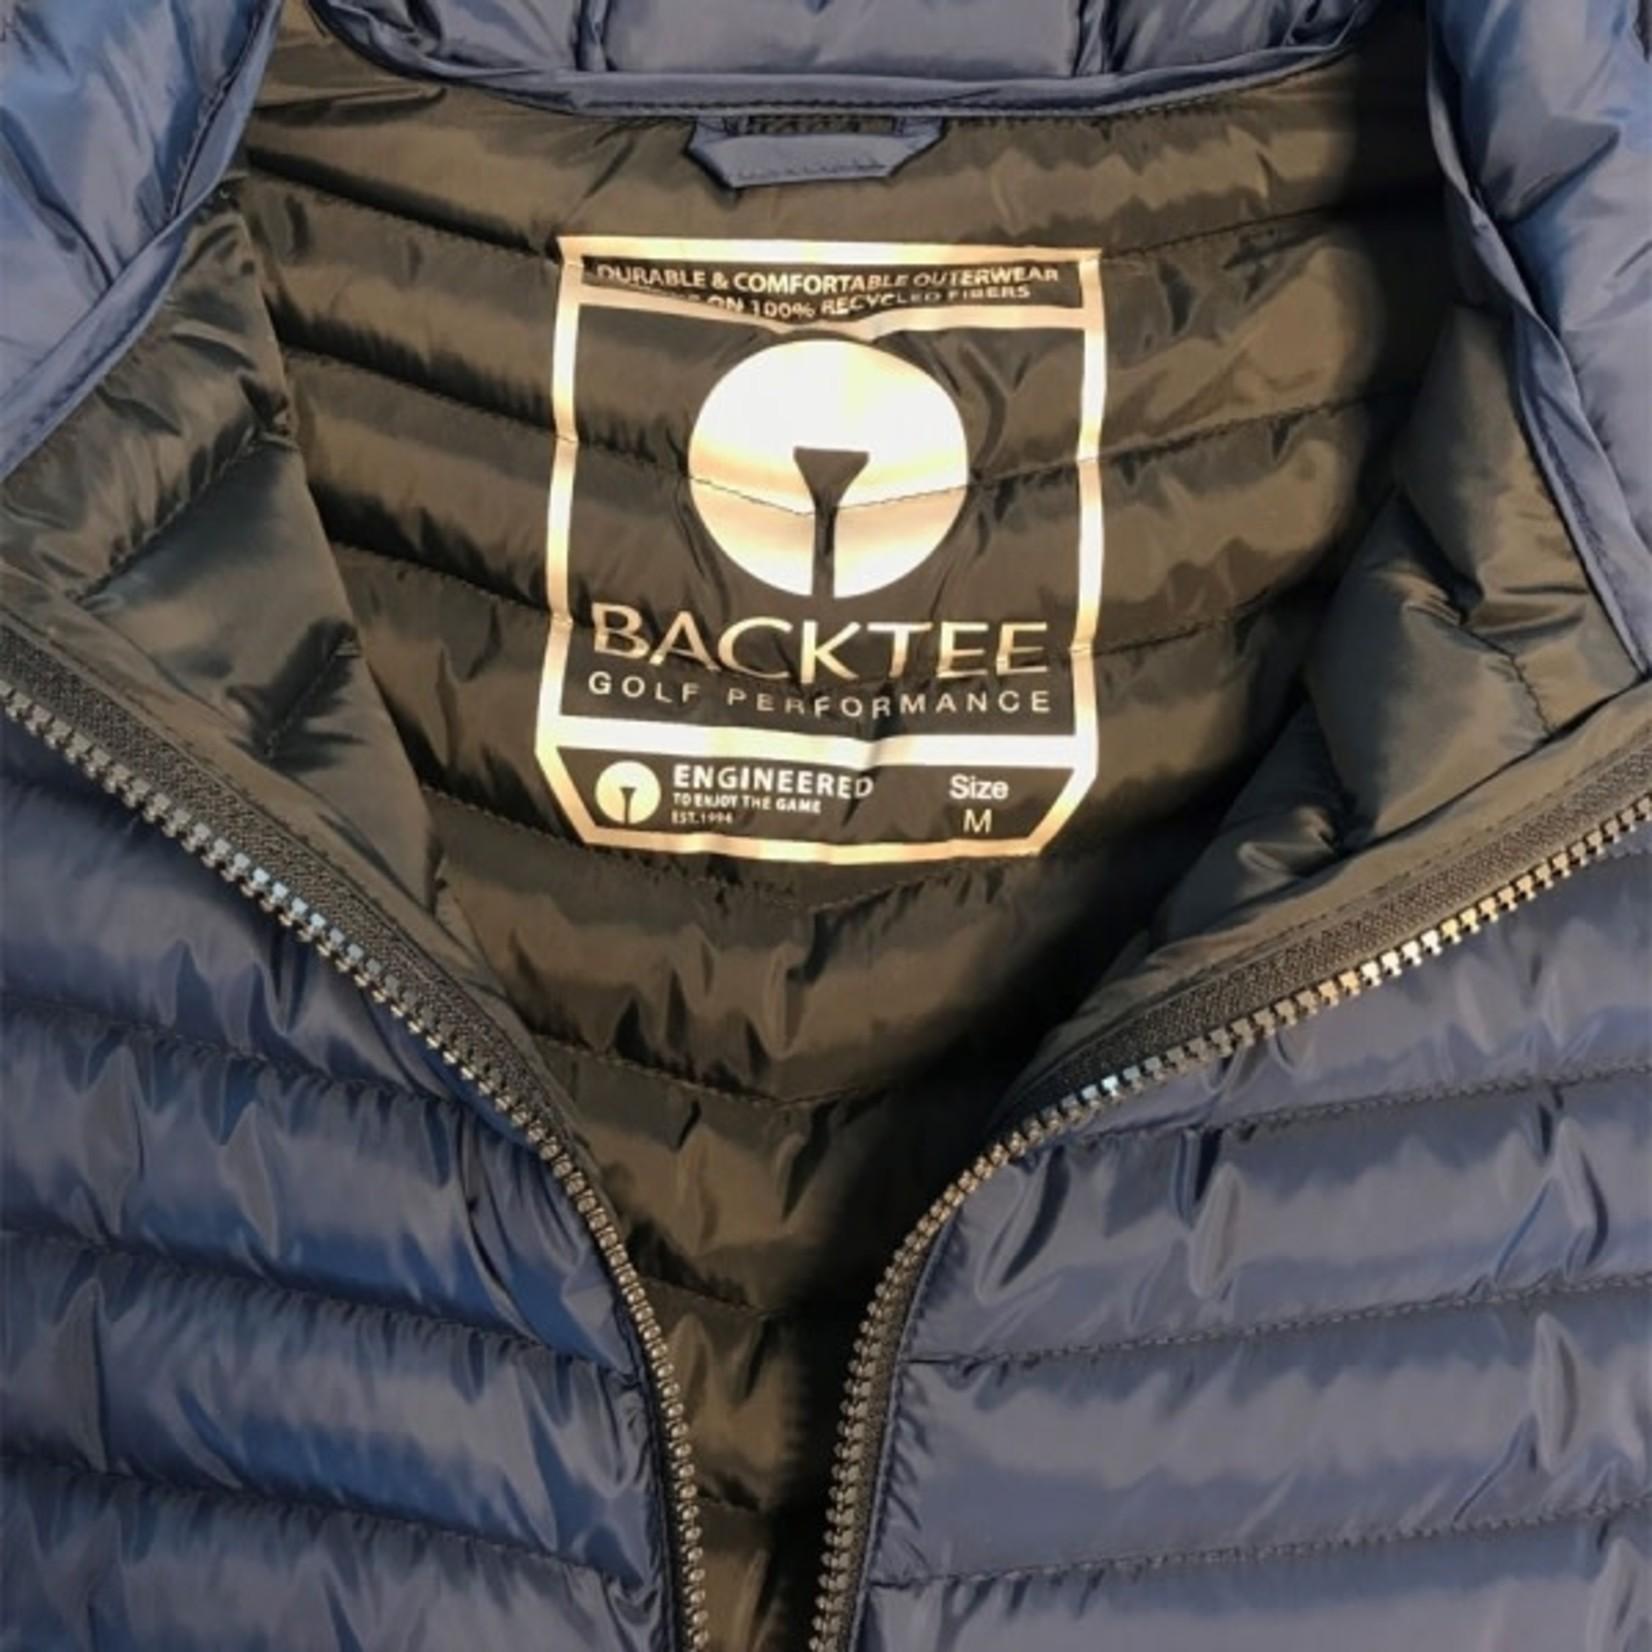 Backtee BackTee Ladies Recycled Panel Bodywarmer / Gilet Navy